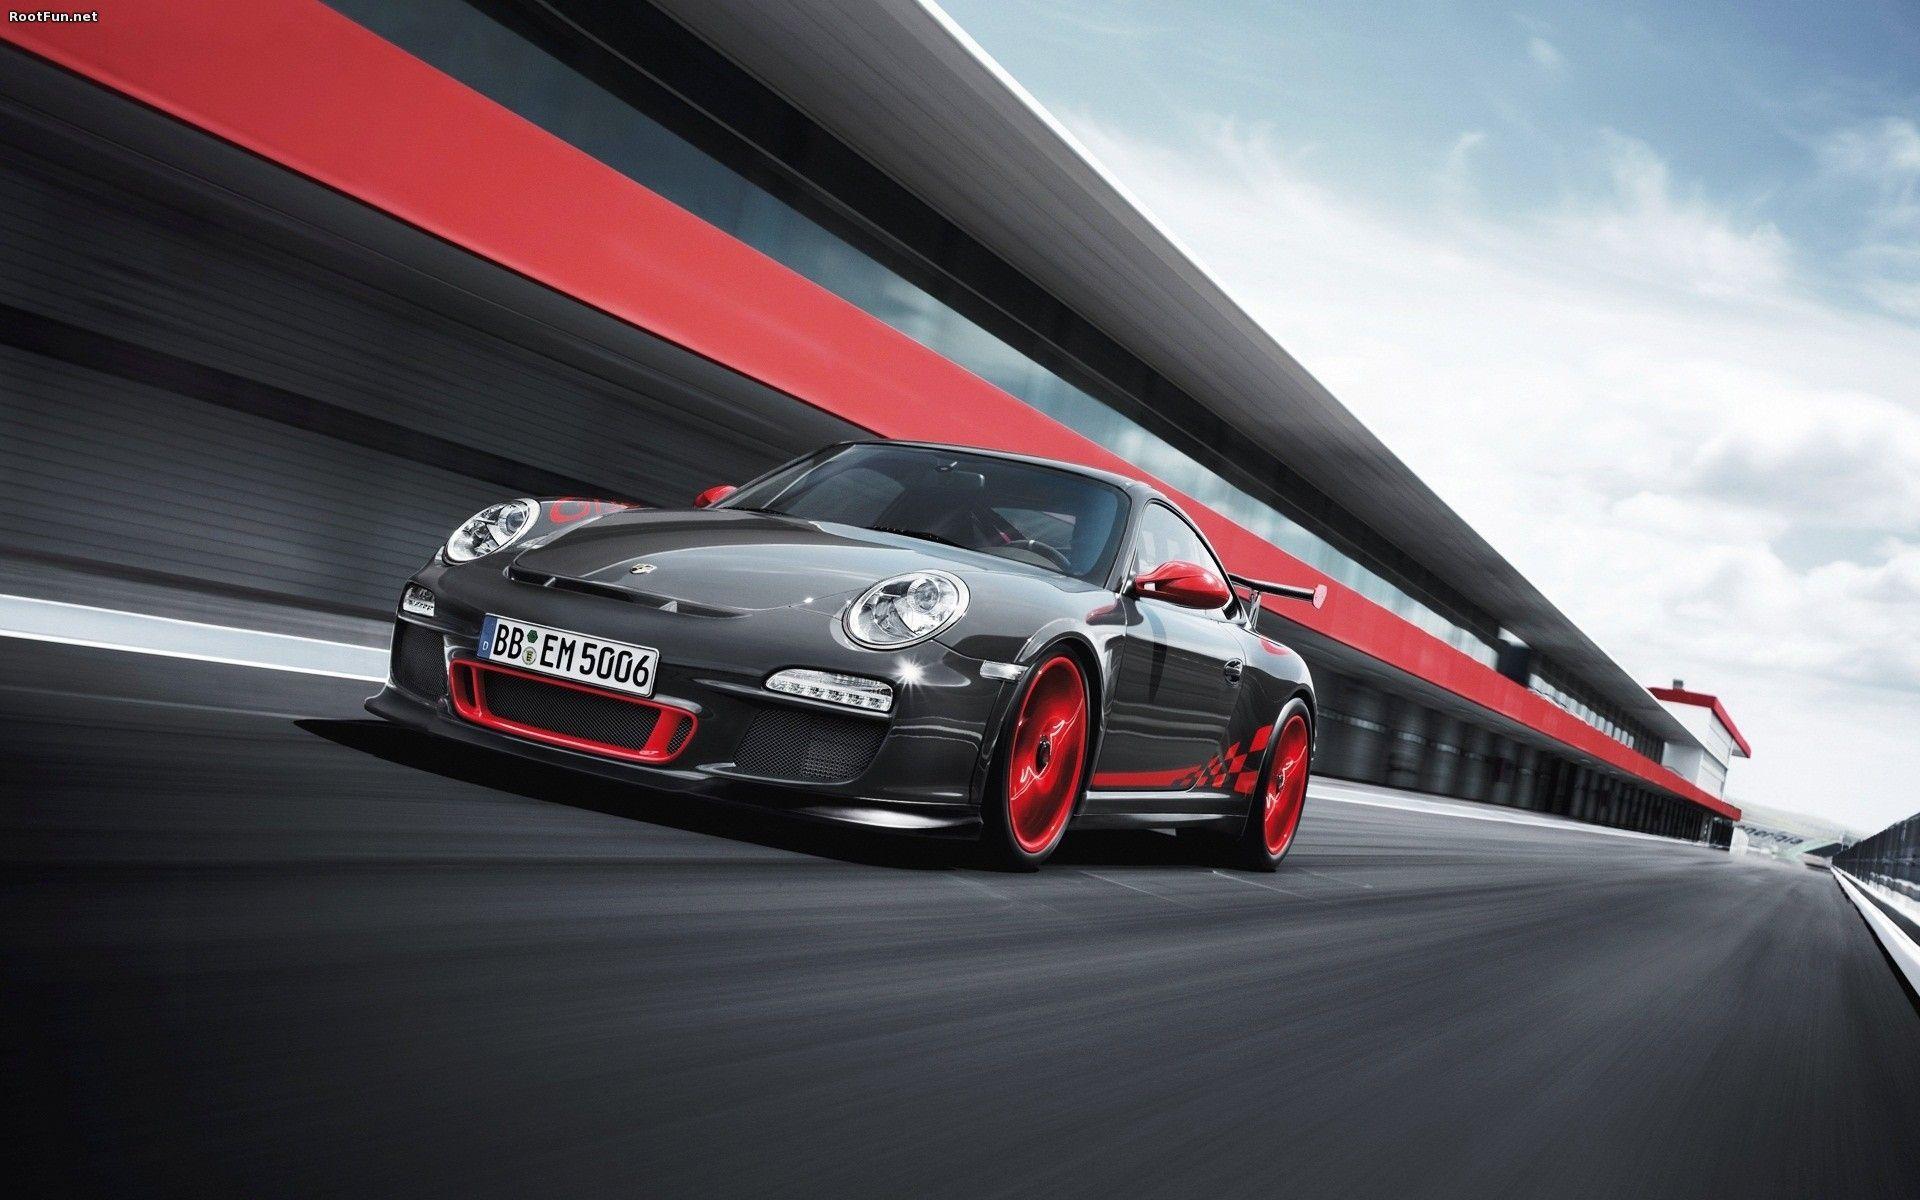 Wallpaper Cars Porsche Wallpapers Car Auto Images Technology Awesome Porsche Gt Porsche 911 Gt3 Porsche